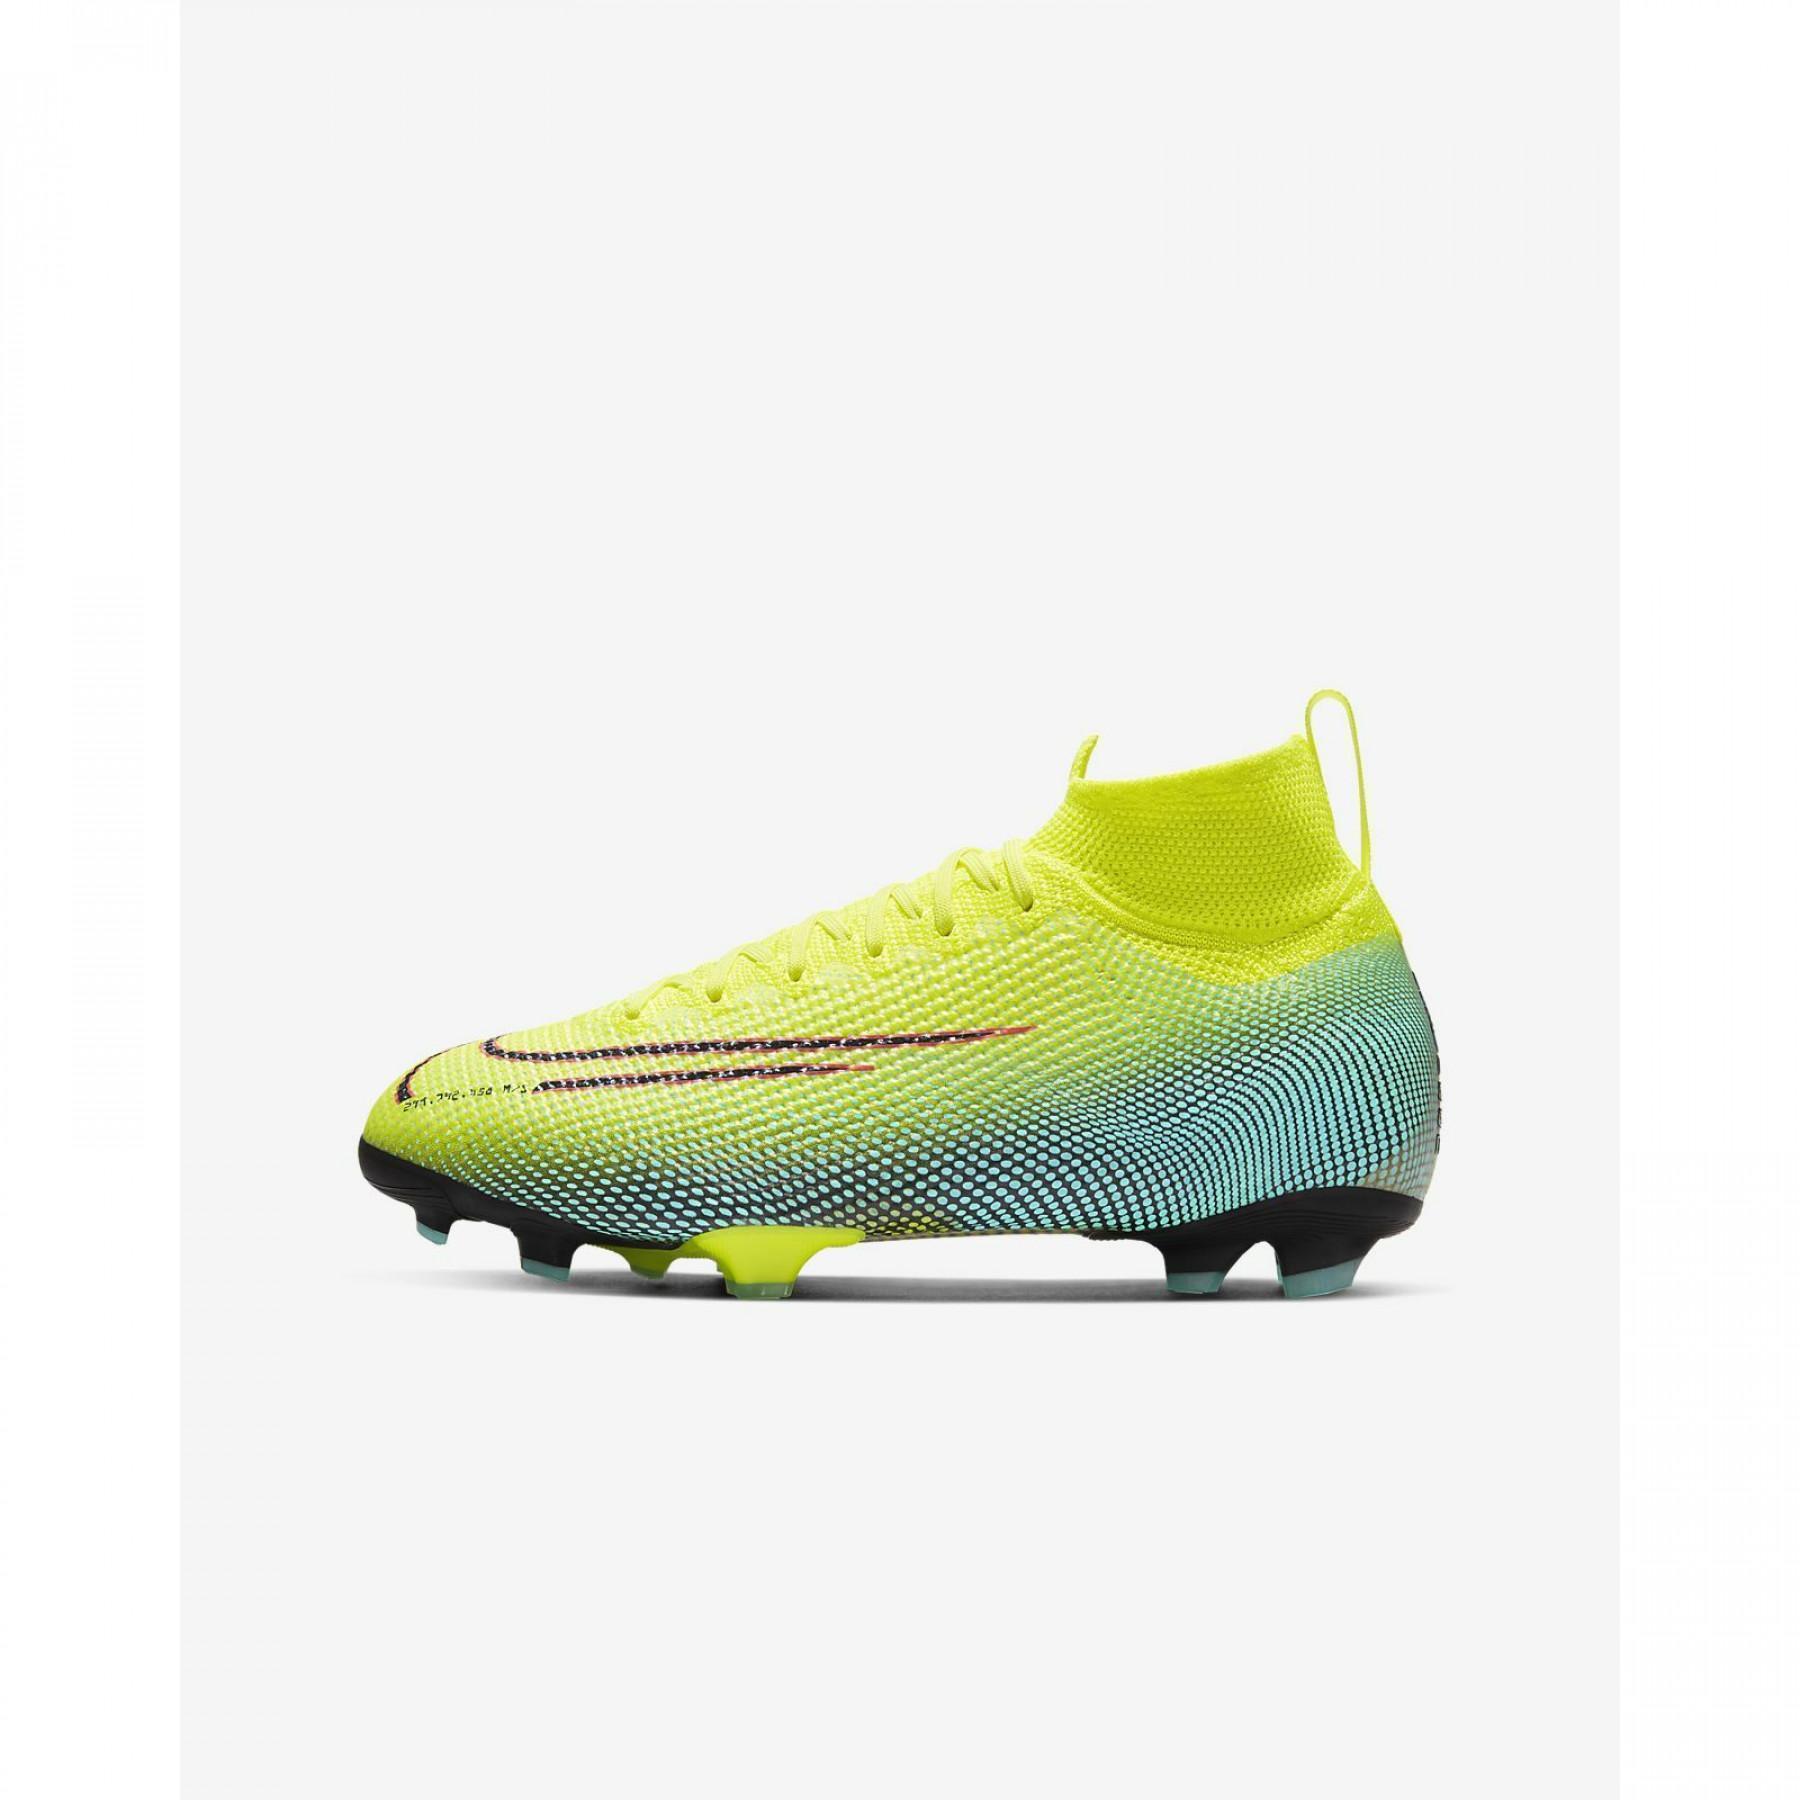 Chaussures kid Nike Mercurial Superfly 7 Elite MDS FG